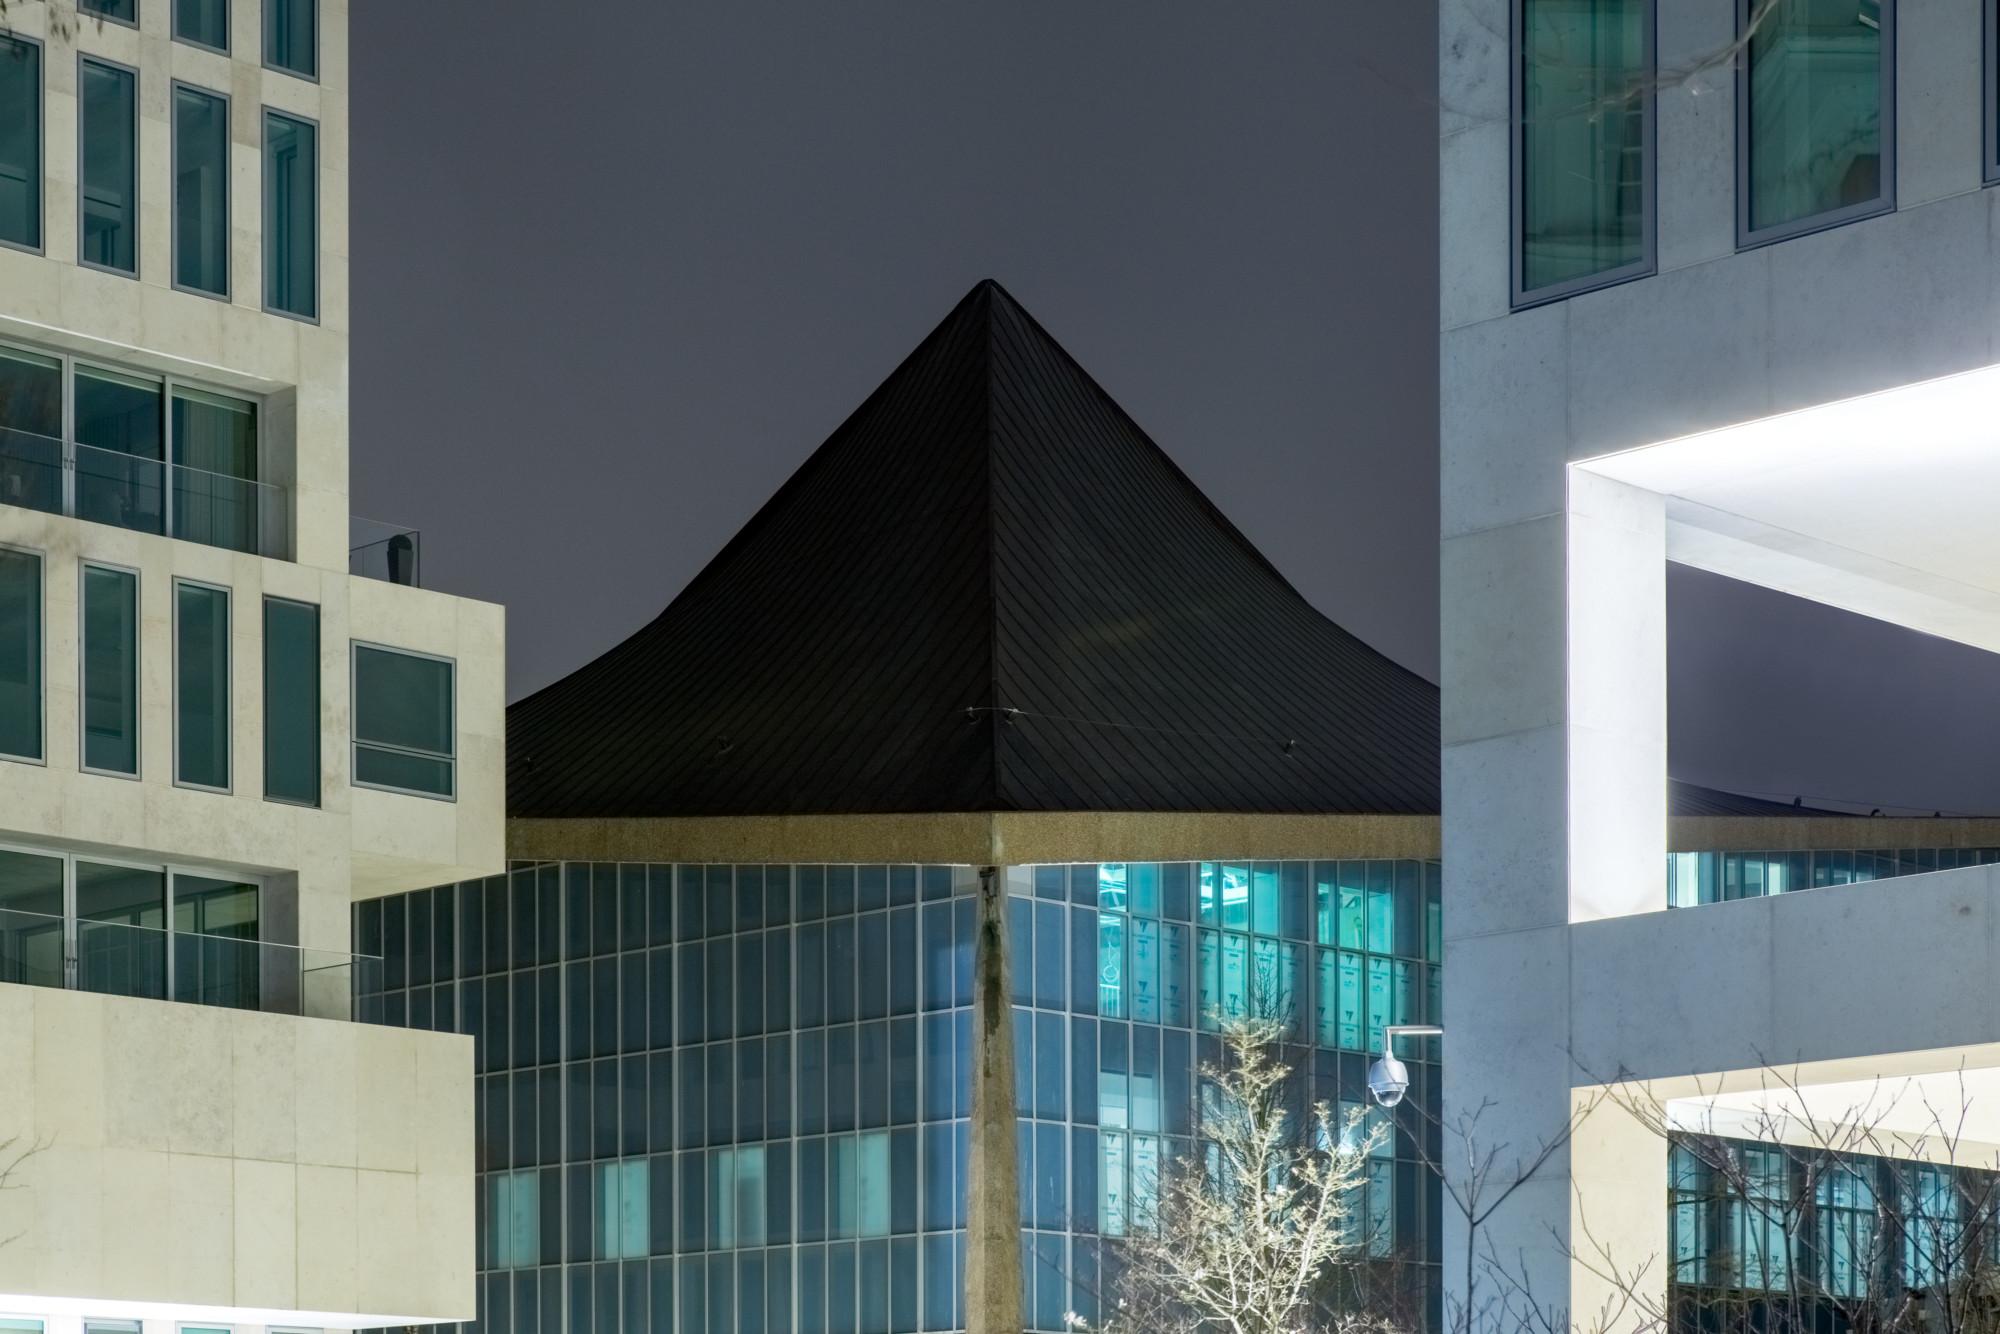 design museum will reopen in london welum. Black Bedroom Furniture Sets. Home Design Ideas